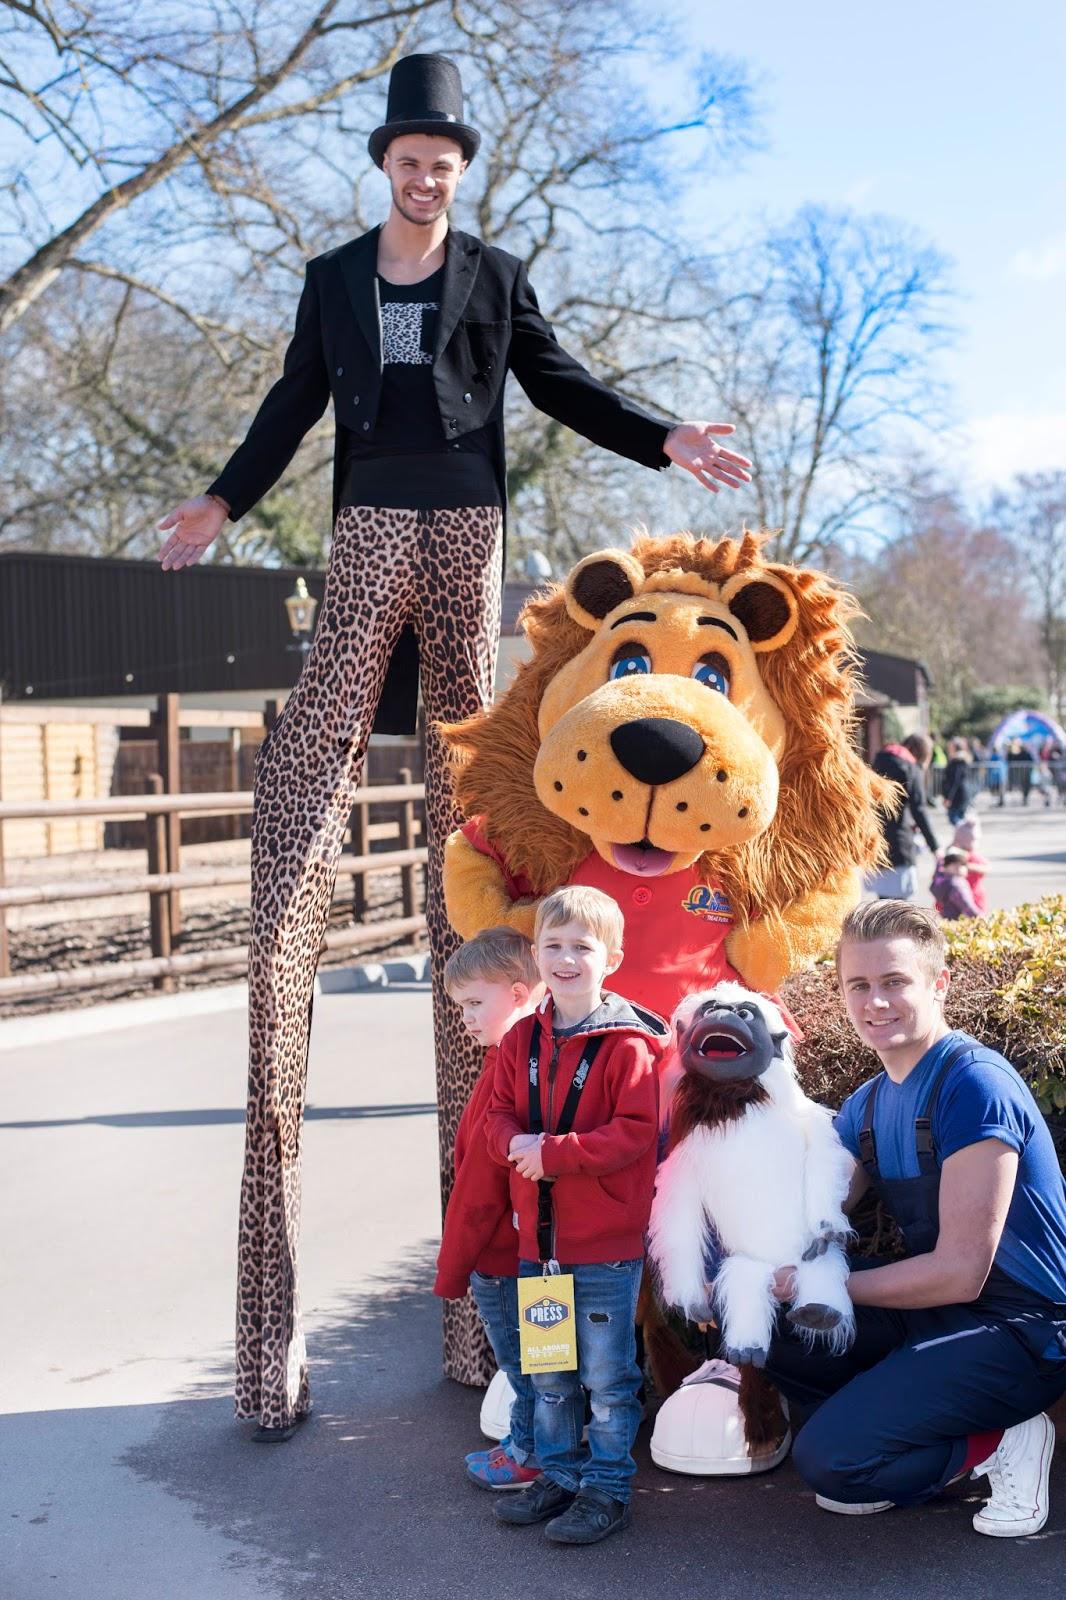 Drayton Manor Park and Zoo Tamarin Trail